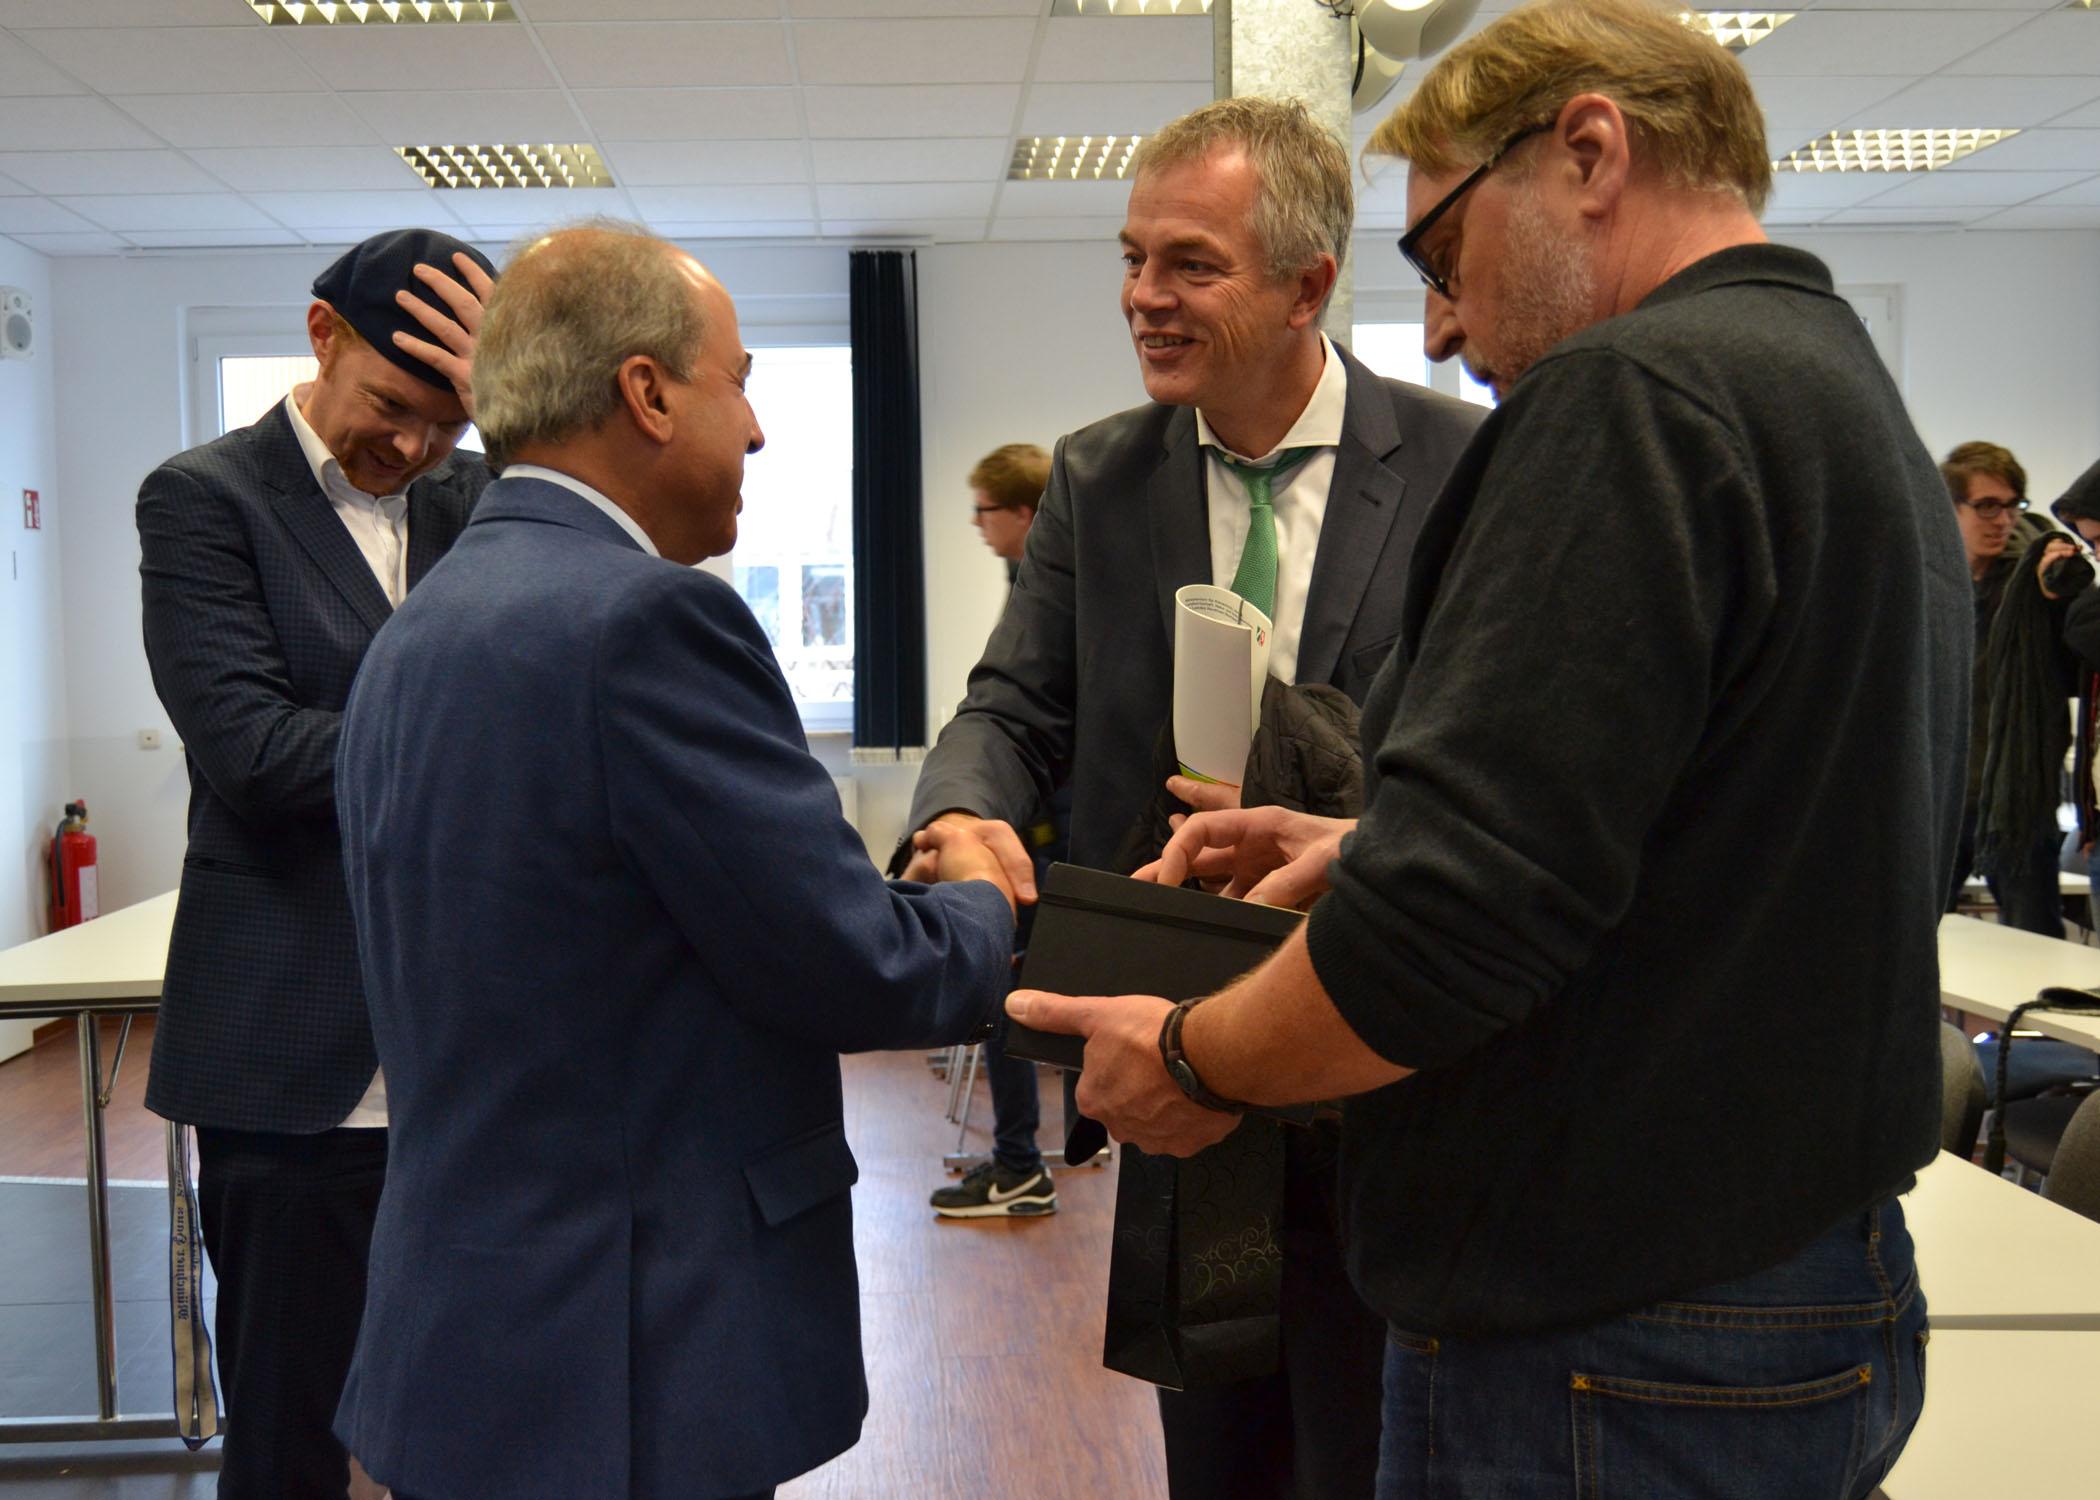 Der Geschäftsführer der HMKW-Trägergesellschaft, Ameir Jillab, bedankt sich bei NRW-Umweltminister Johannes Remmel.